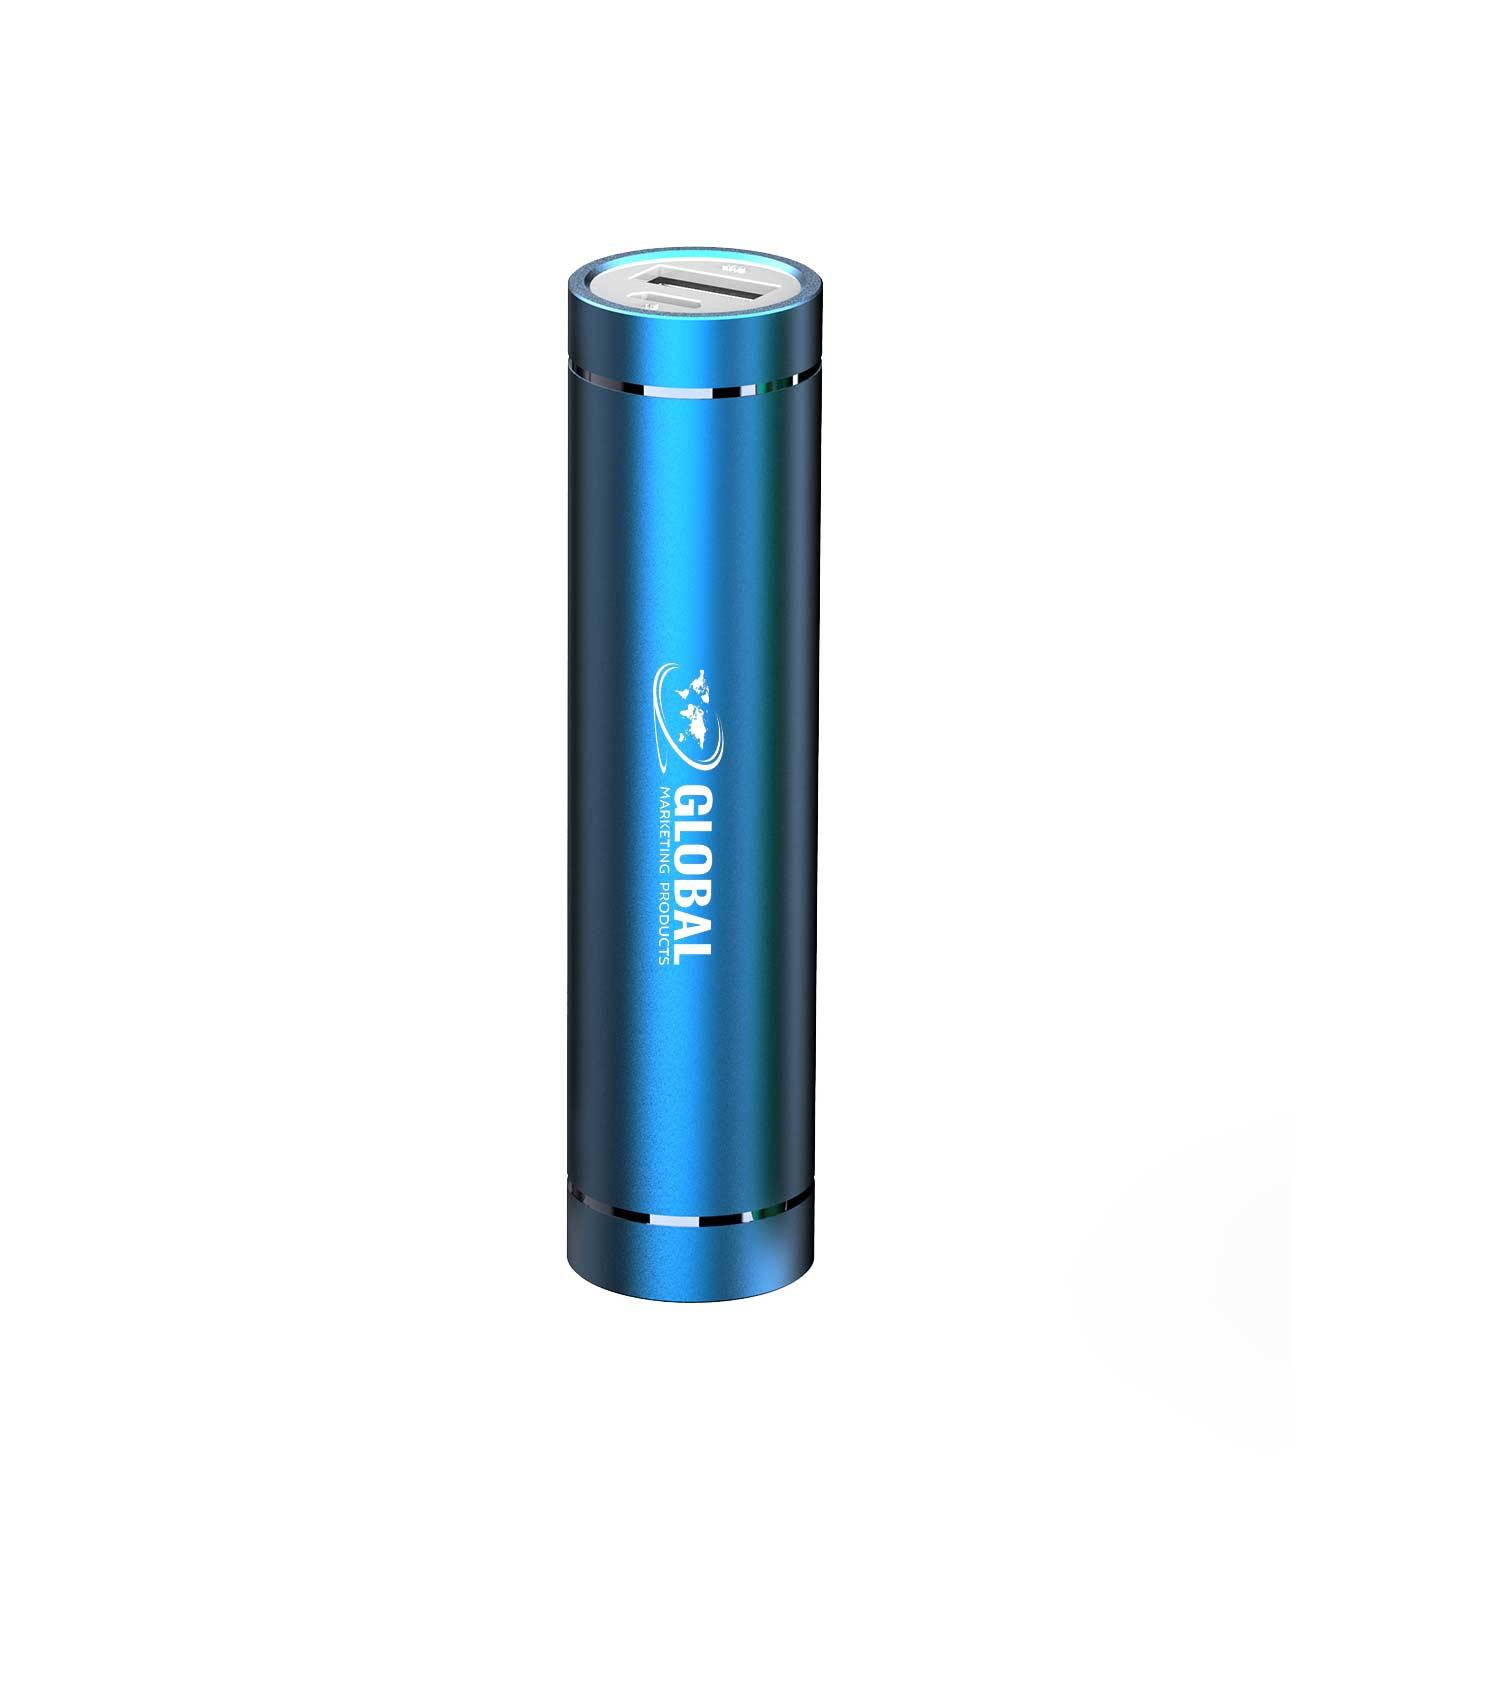 power_bank_1805_blue